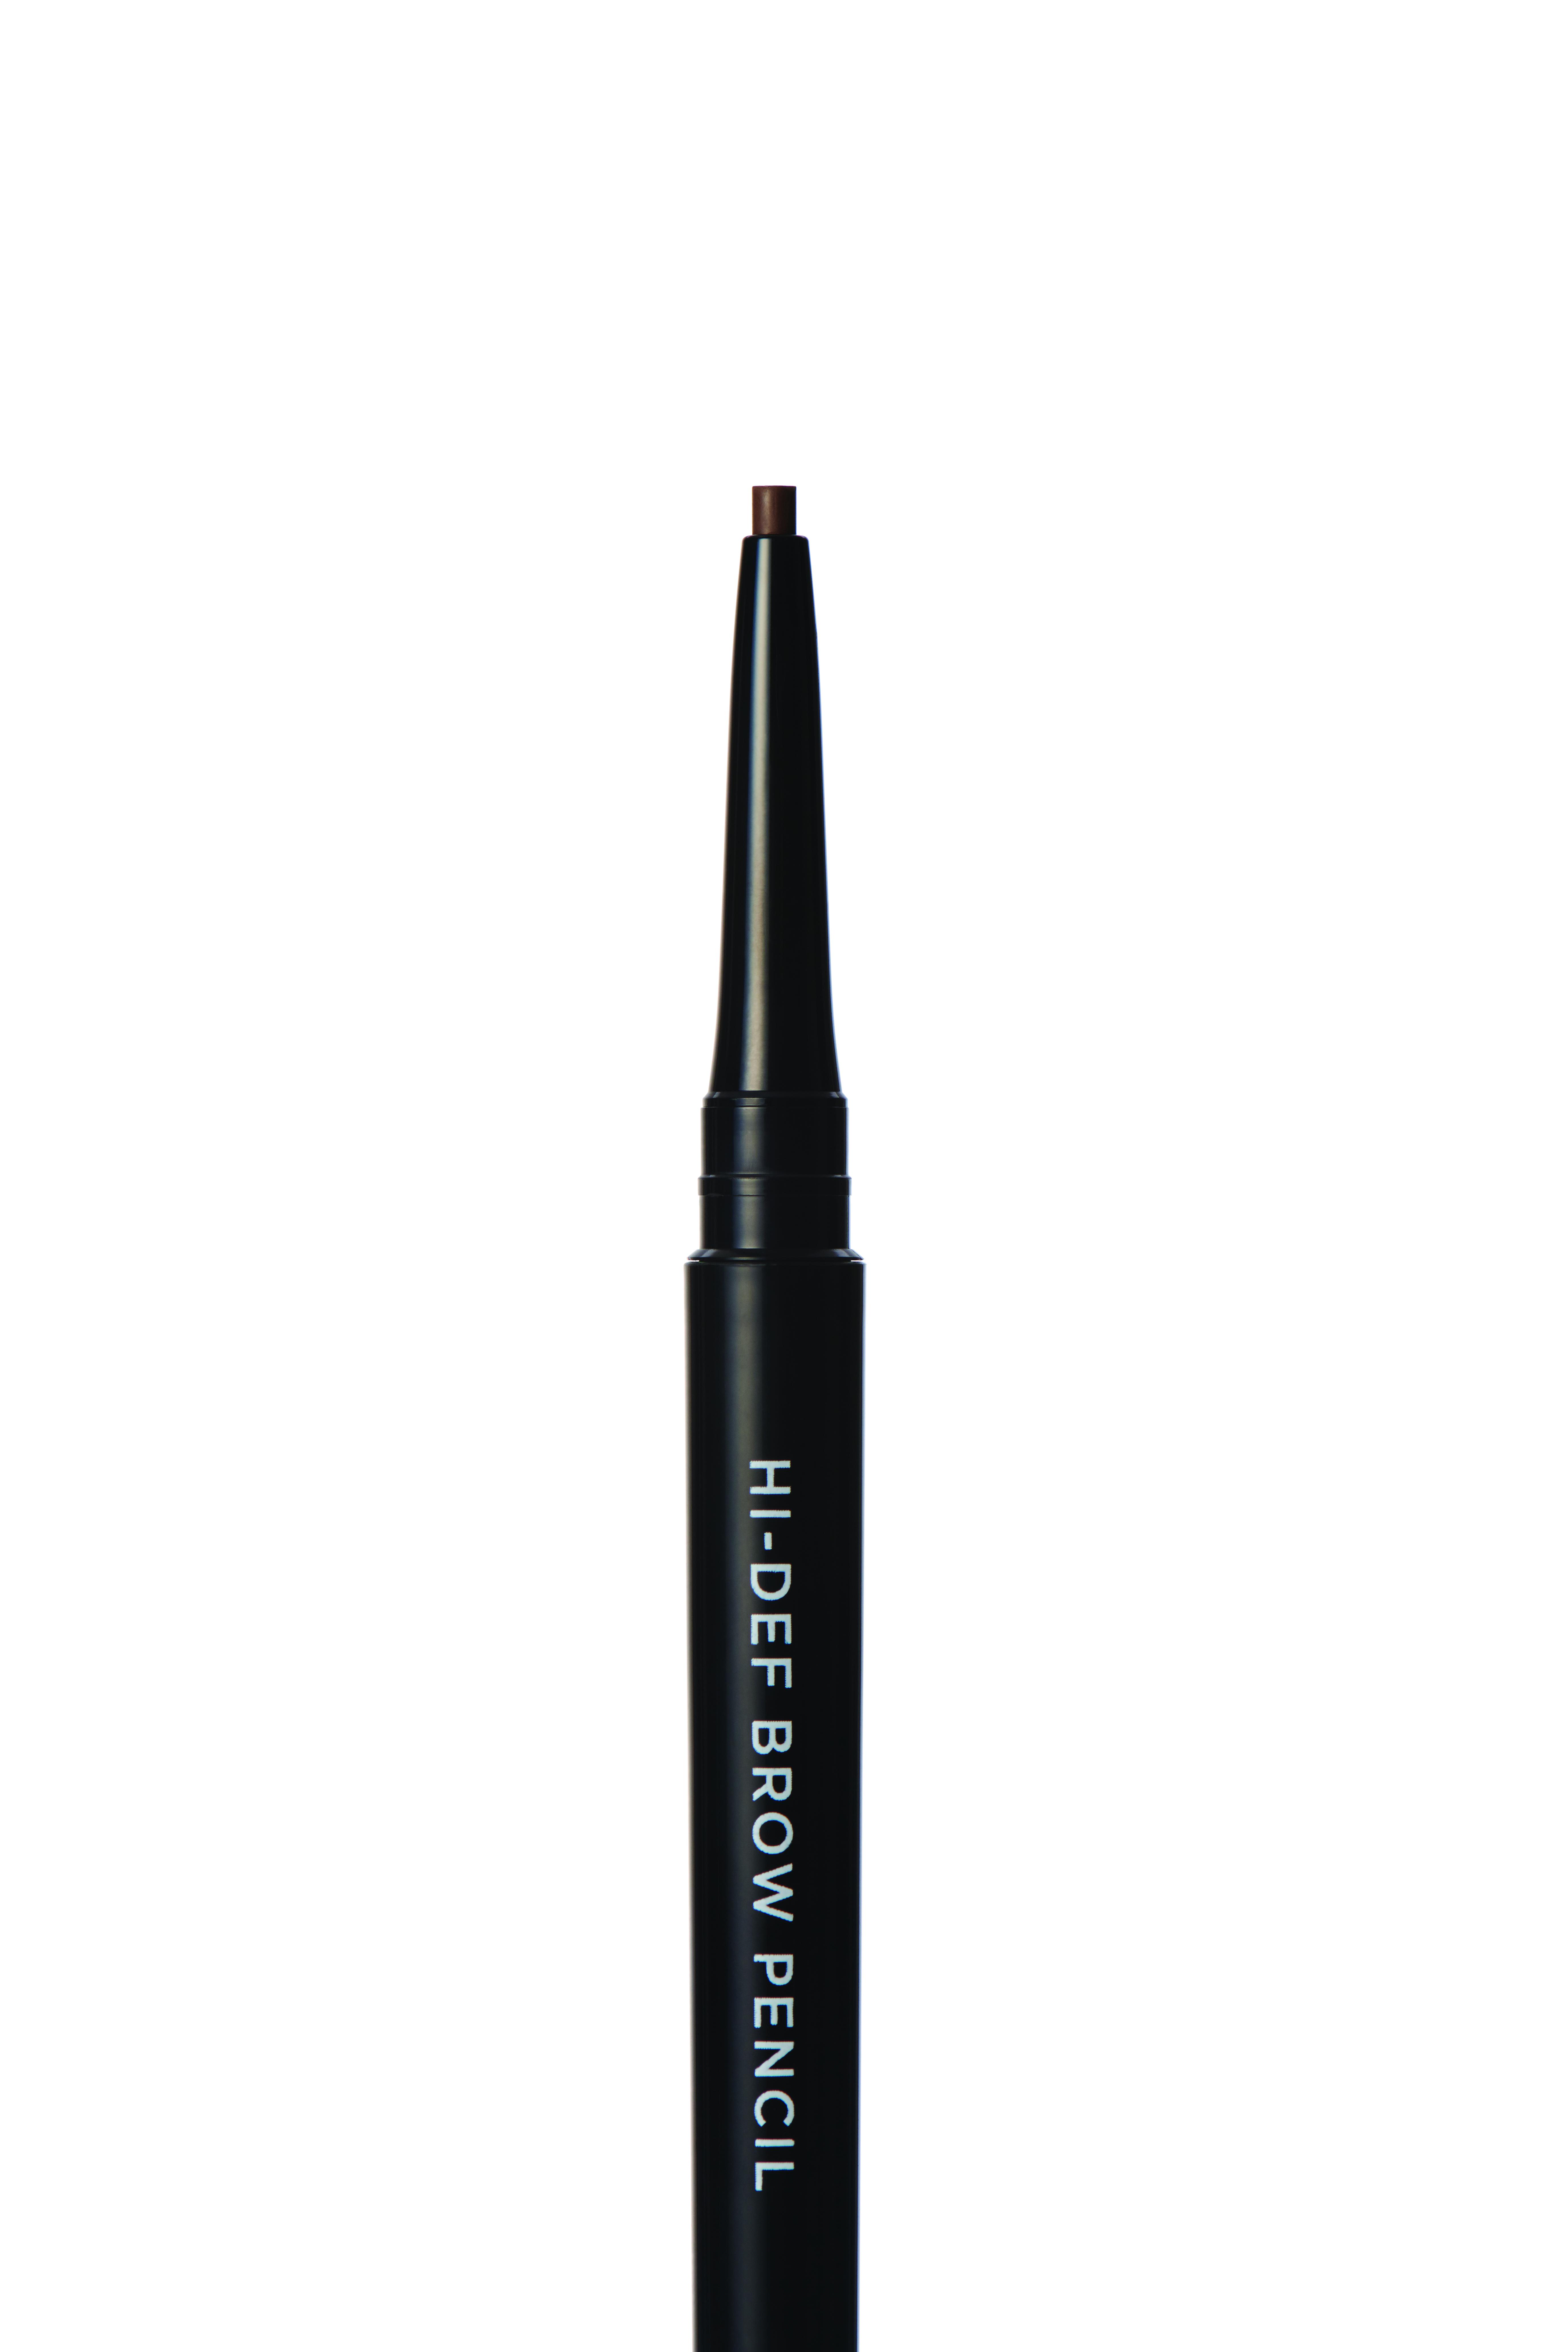 Revitalash Brow Pencil soft brown